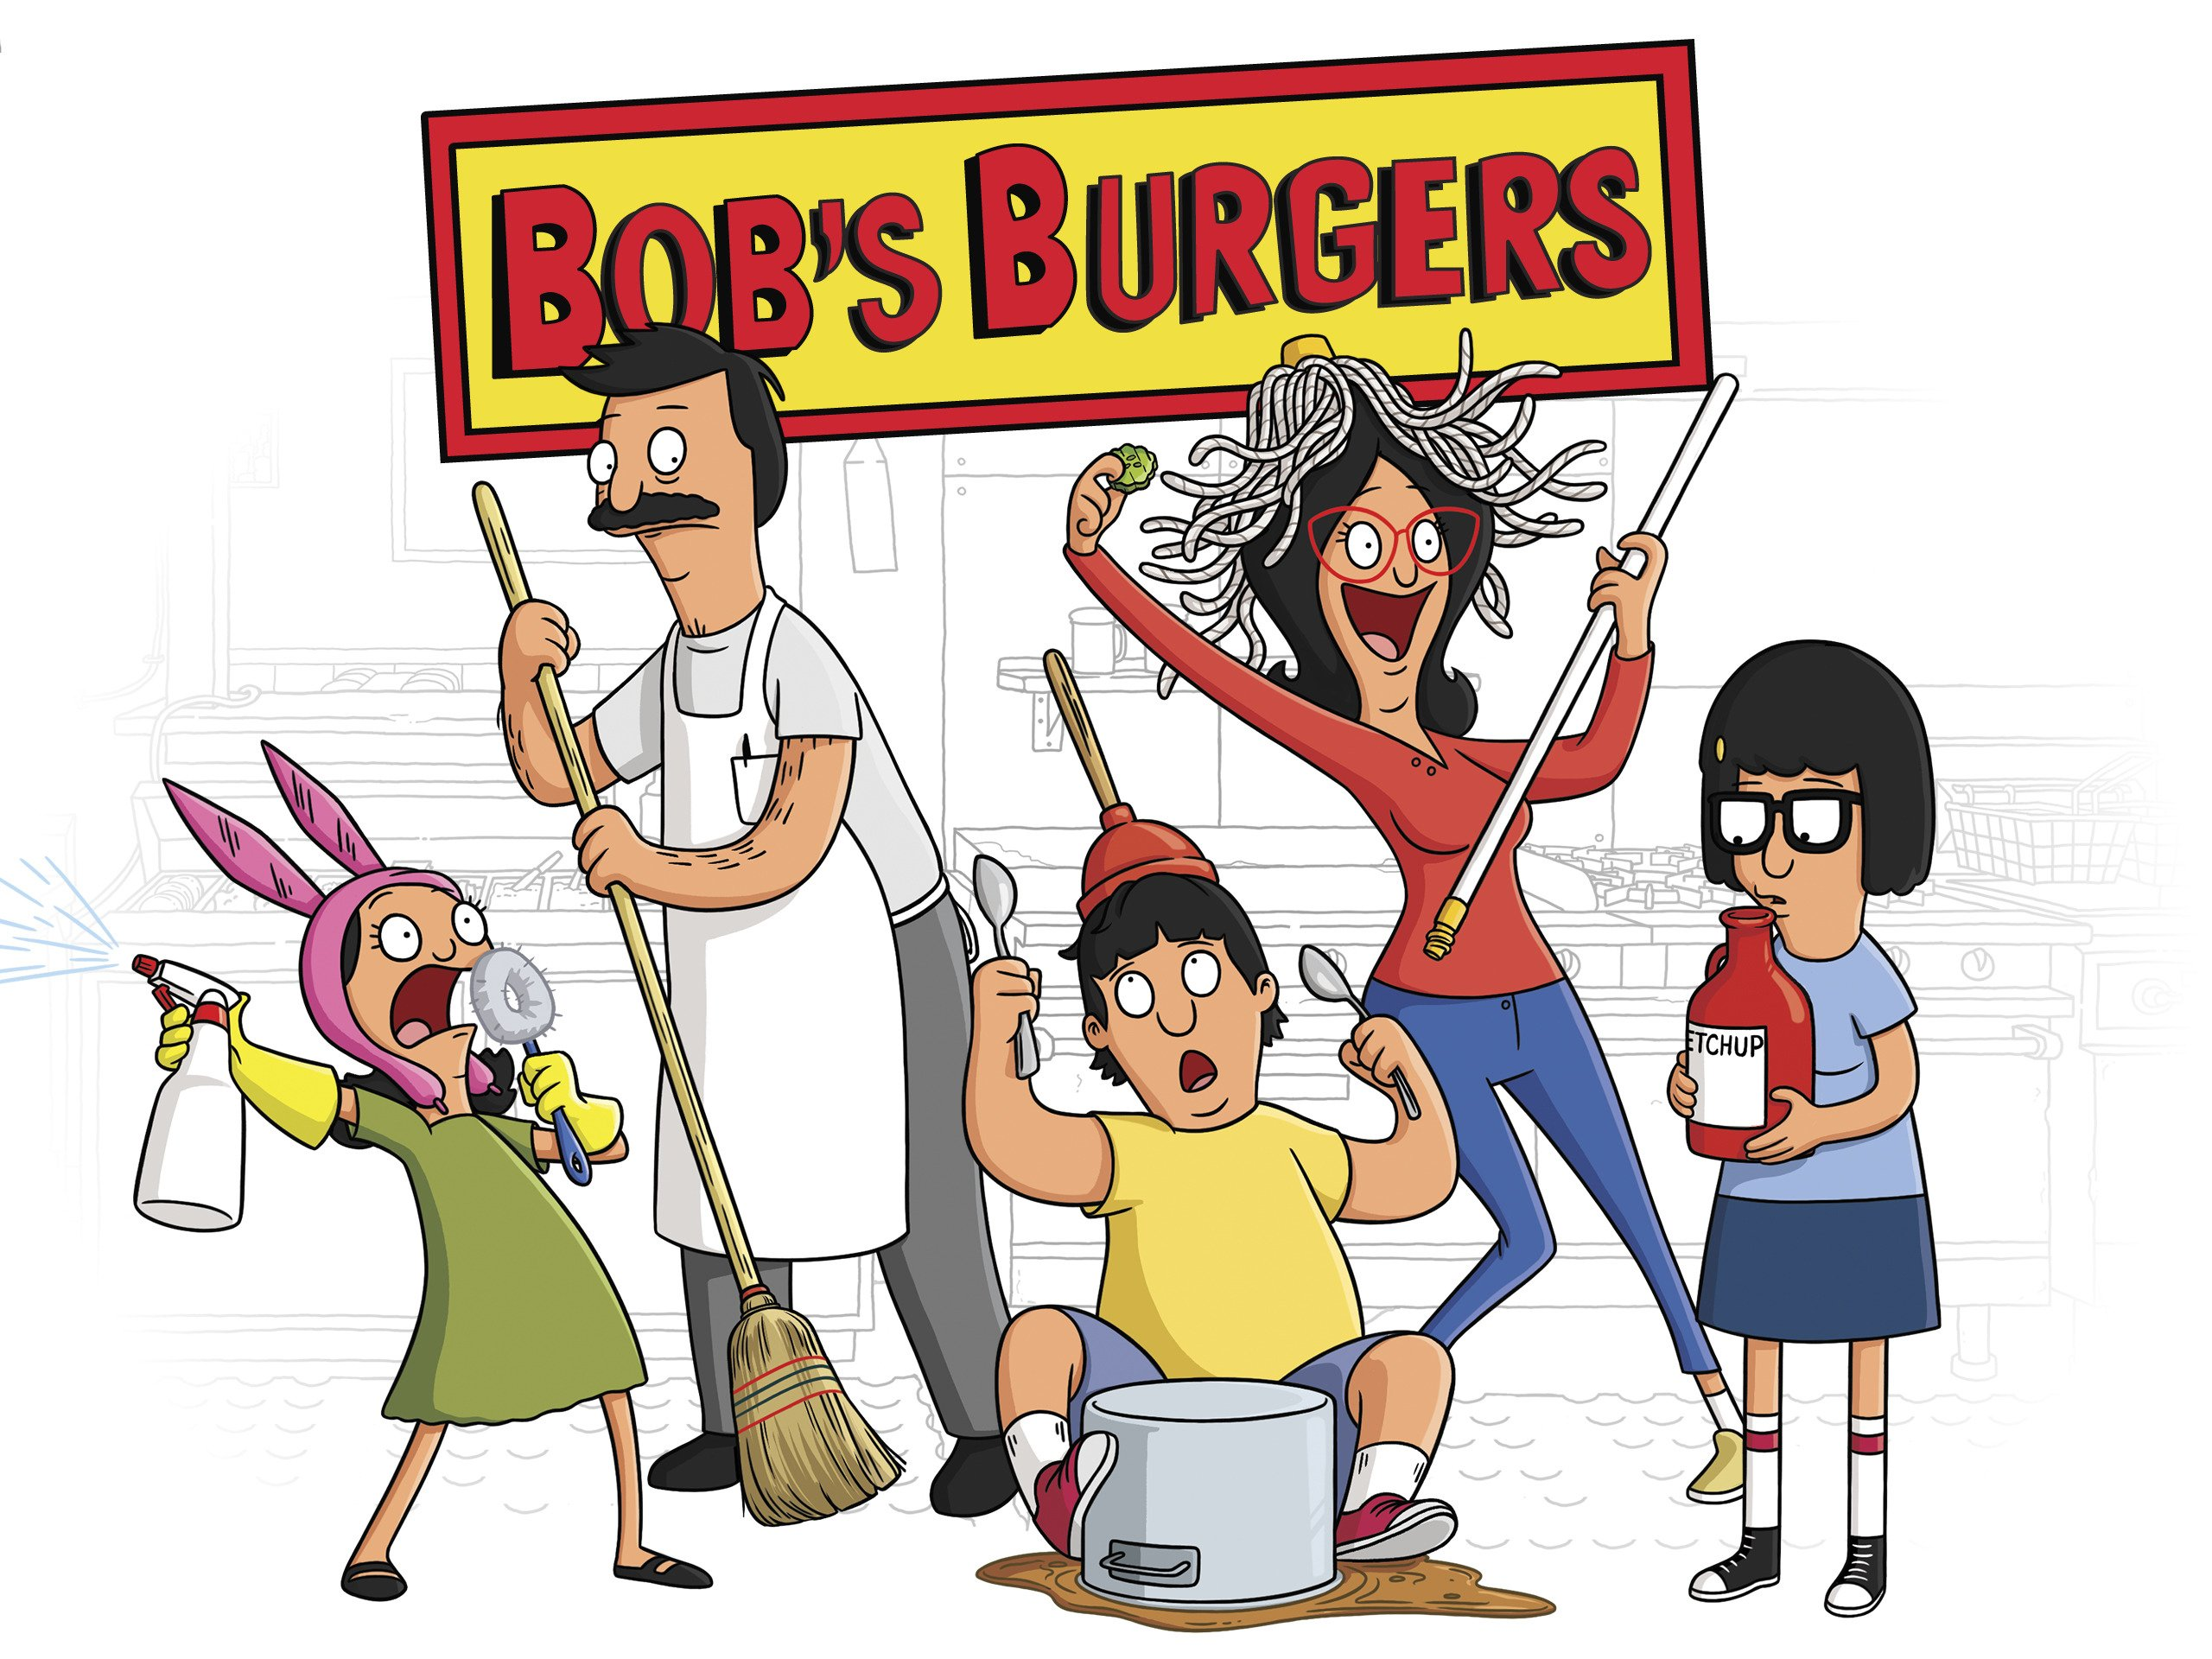 bobs burgers season 4 torrent